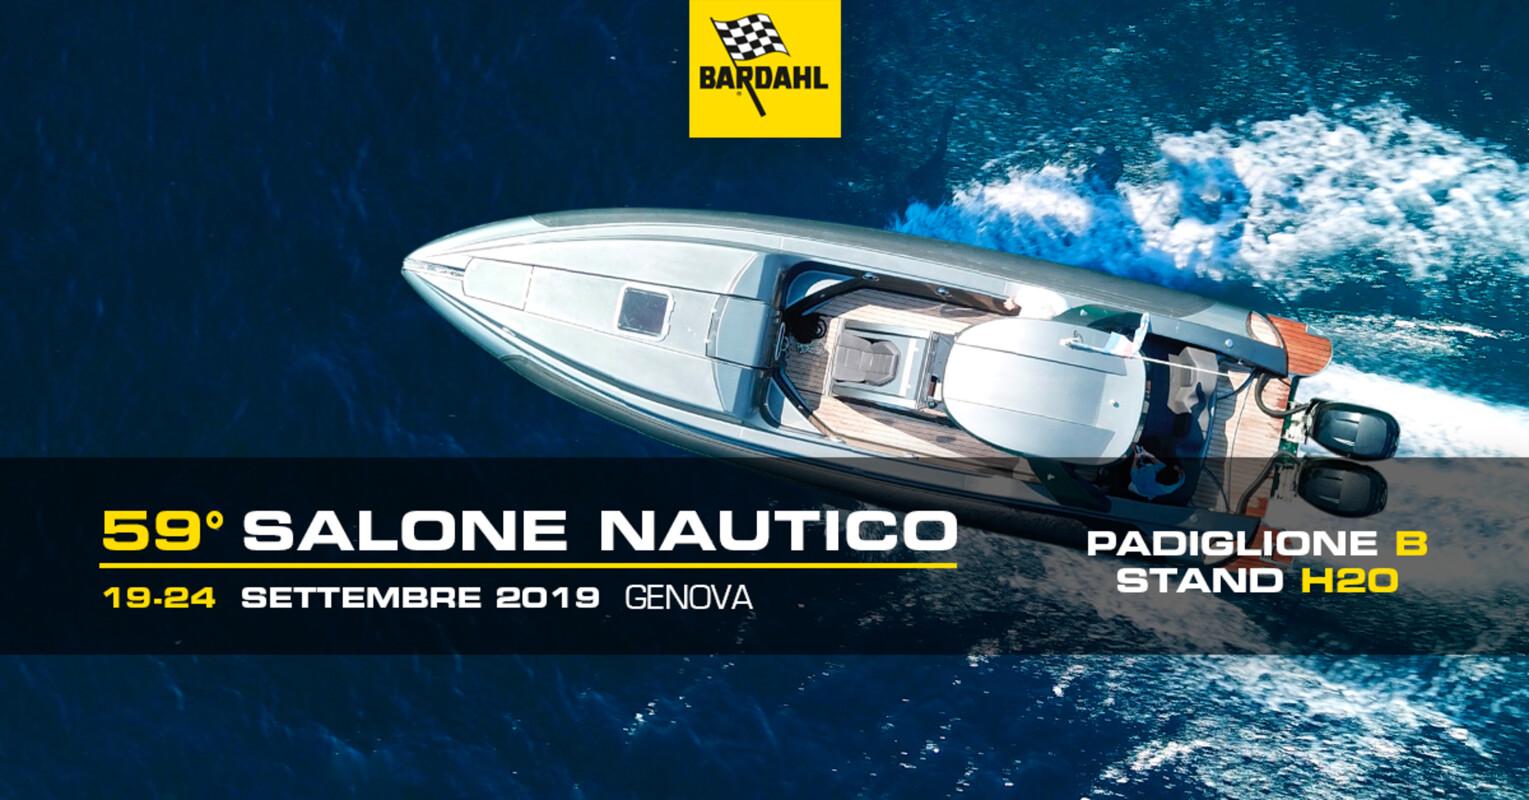 Bardahl Salone Nautico 2019 a Genova